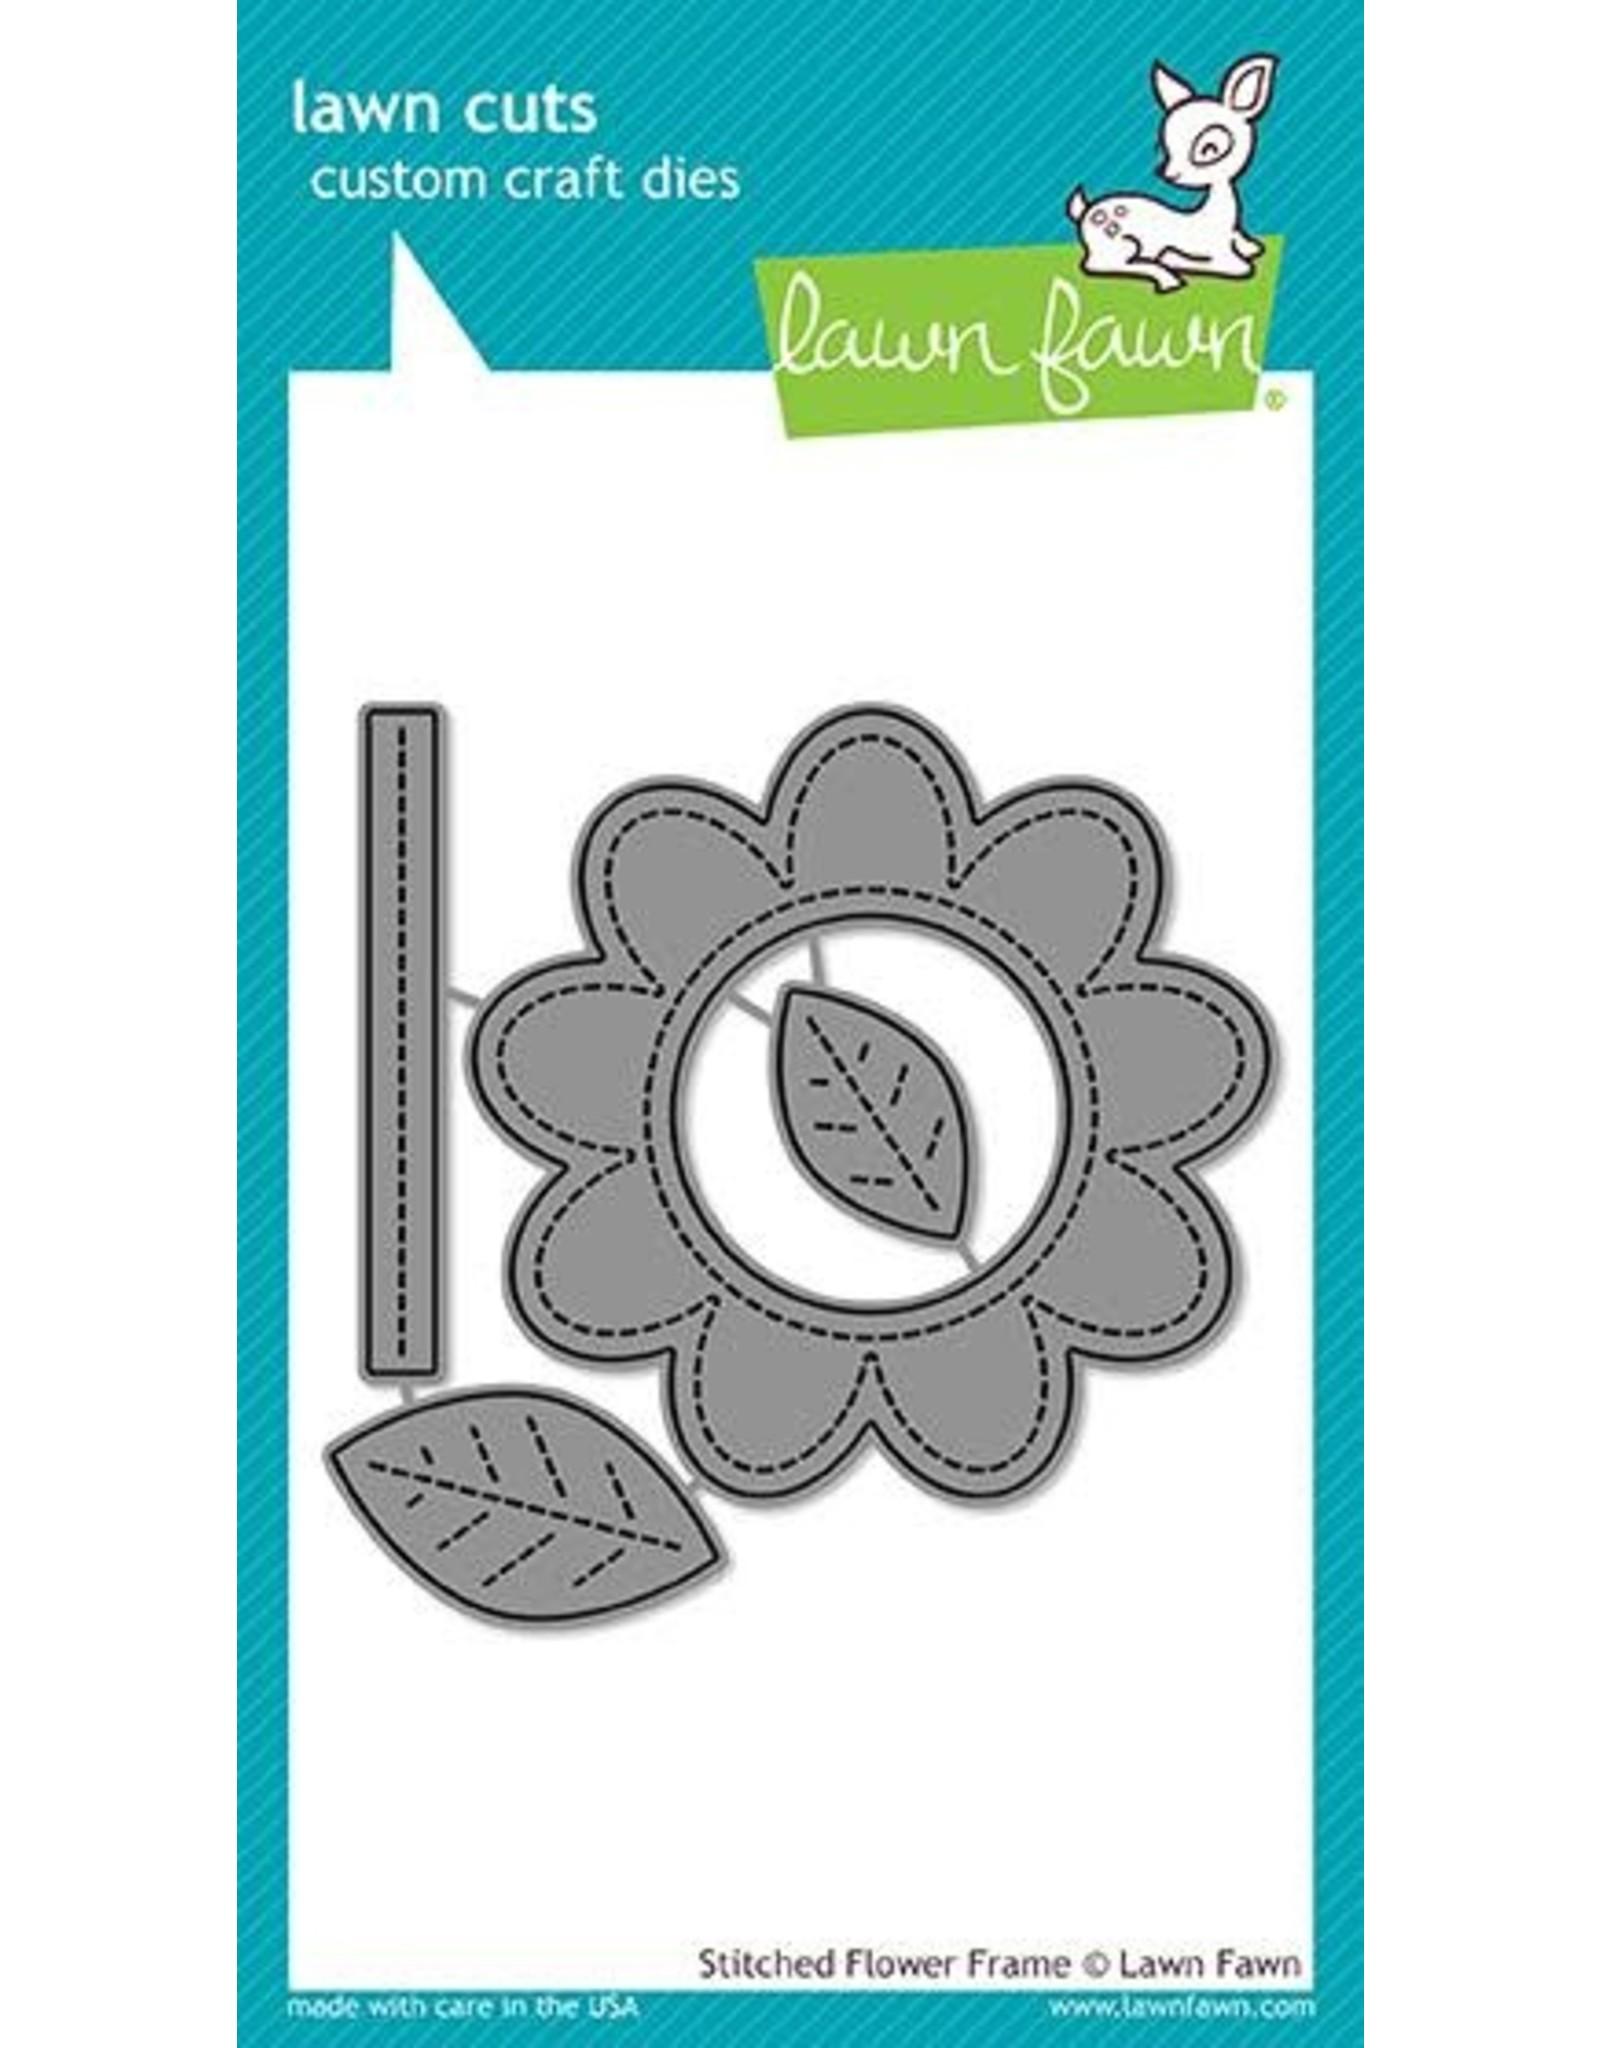 Lawn Fawn Stitched Flower Frame Die Set